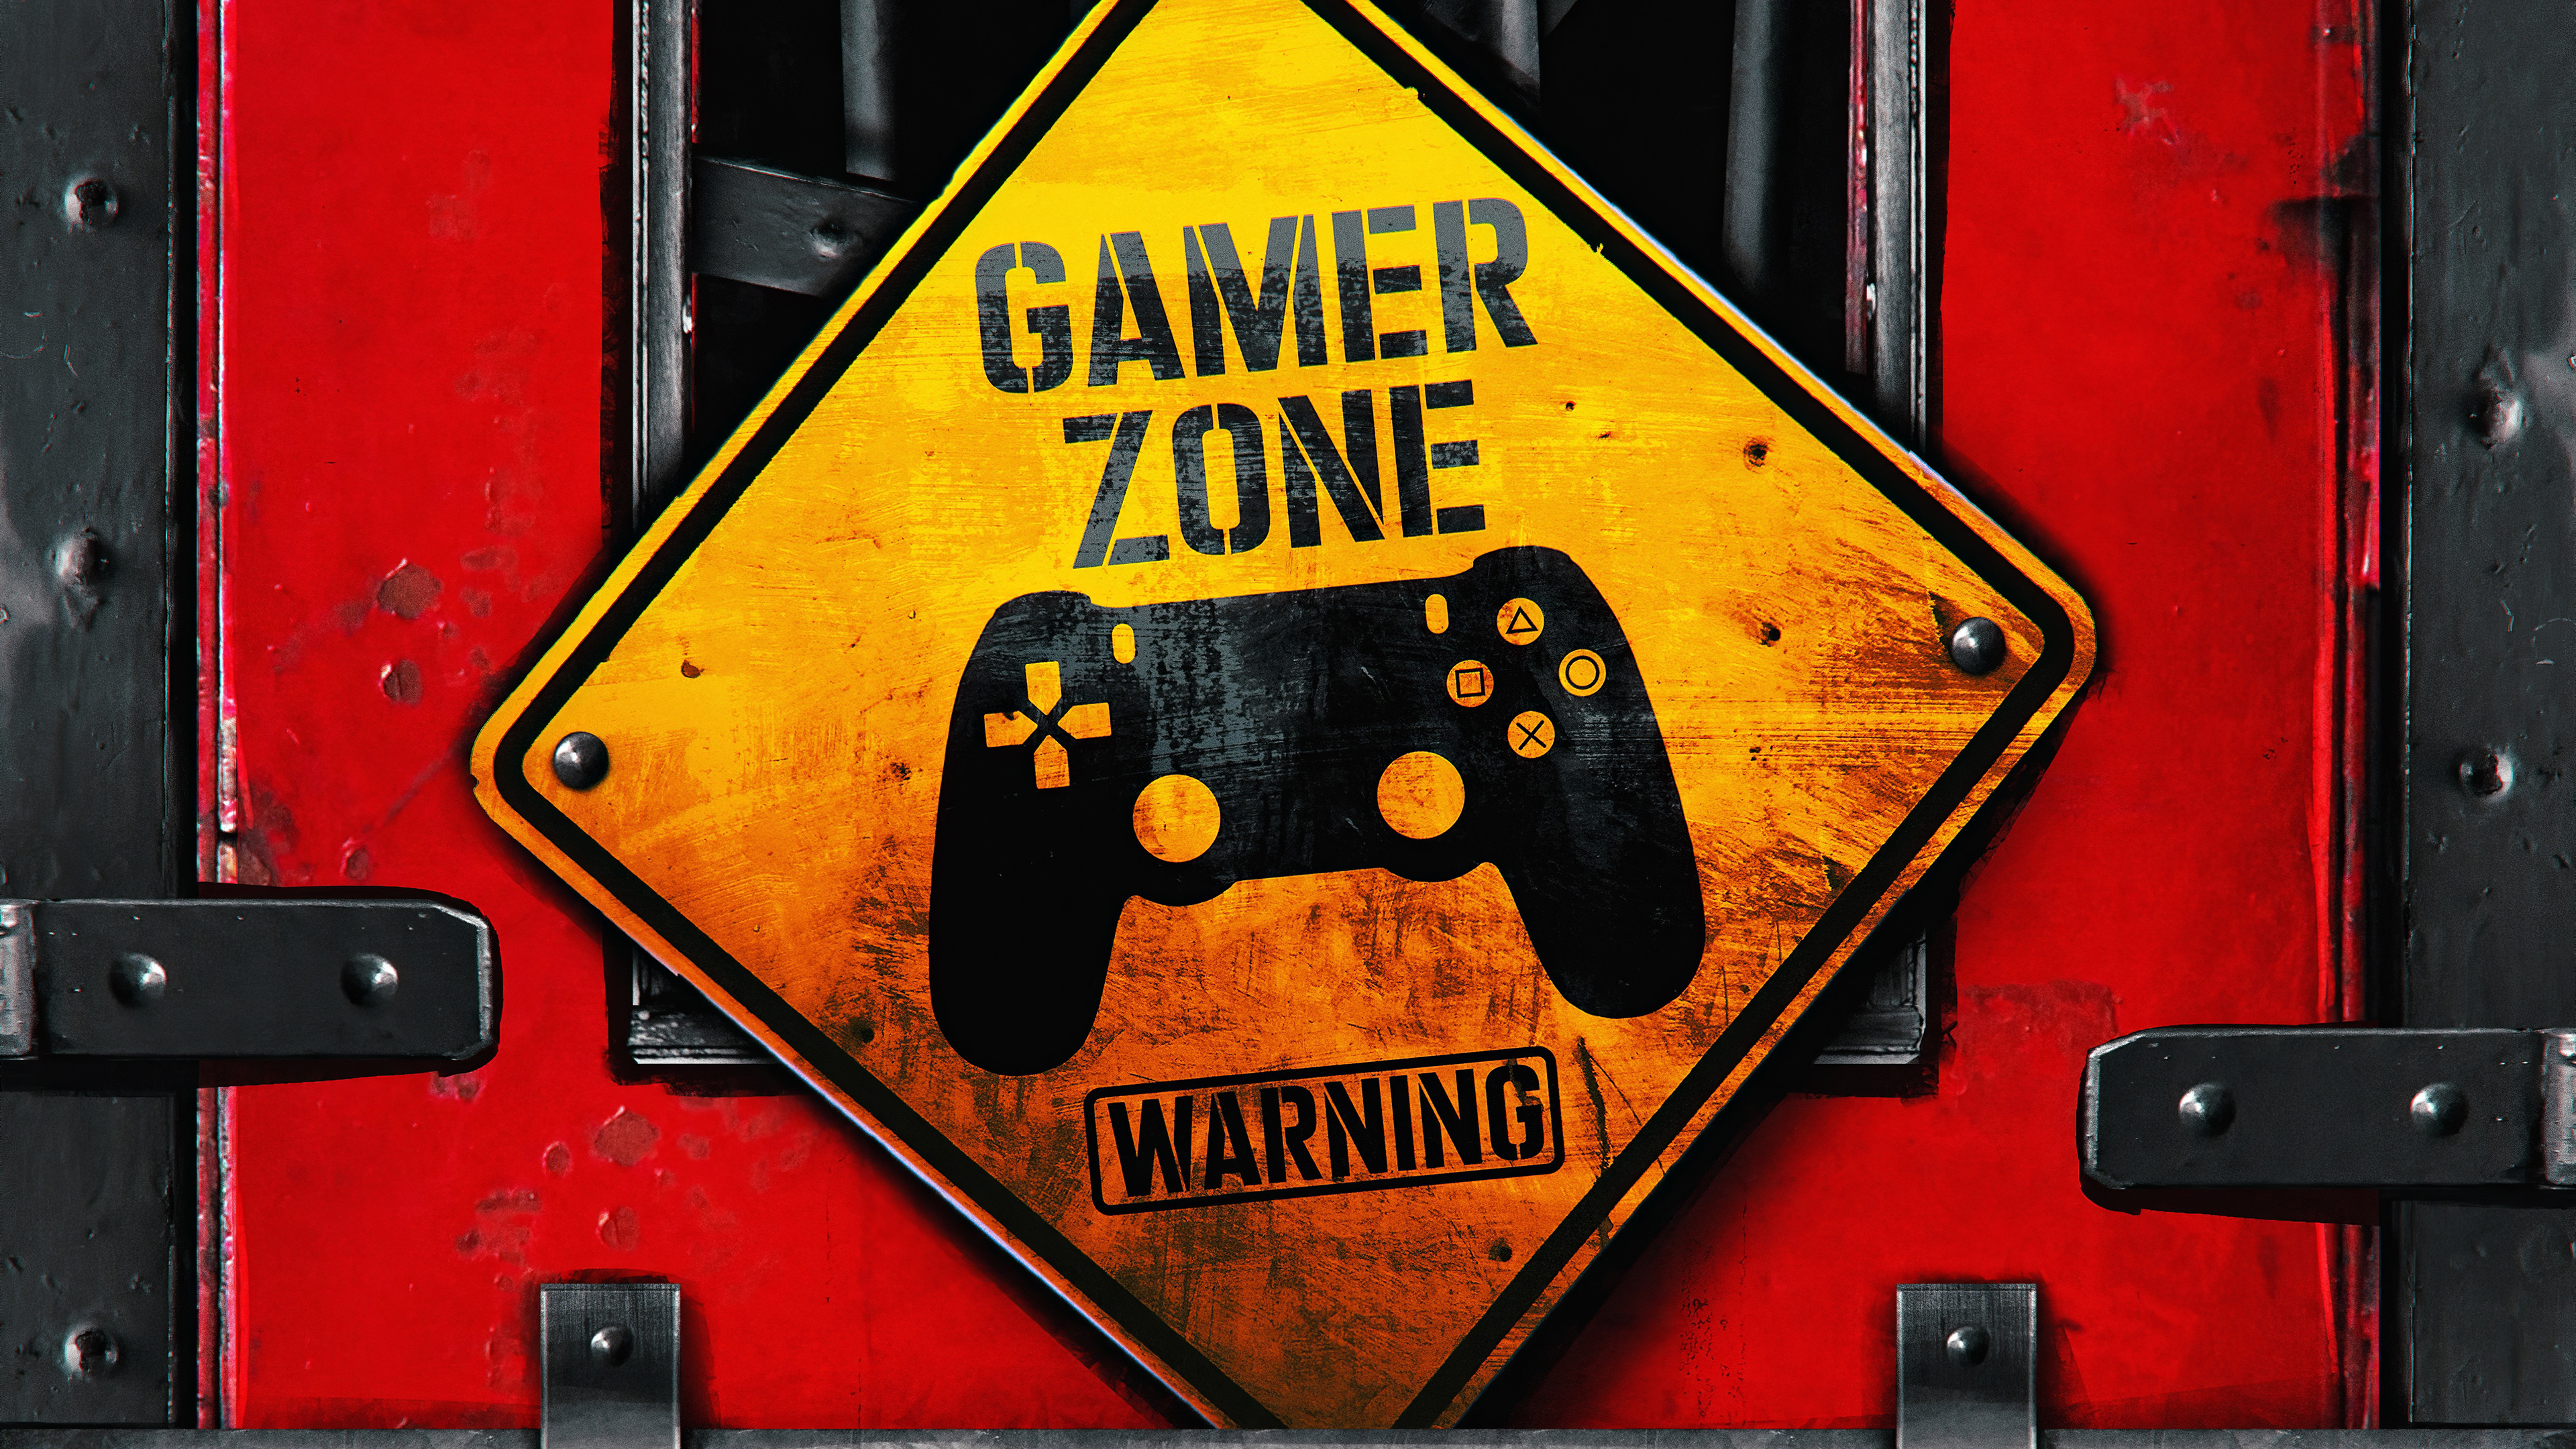 gamer zone 4k 9u 3840x2160 1 - Gamer Zone Art - Gamer Zone Art 4k wallpaper